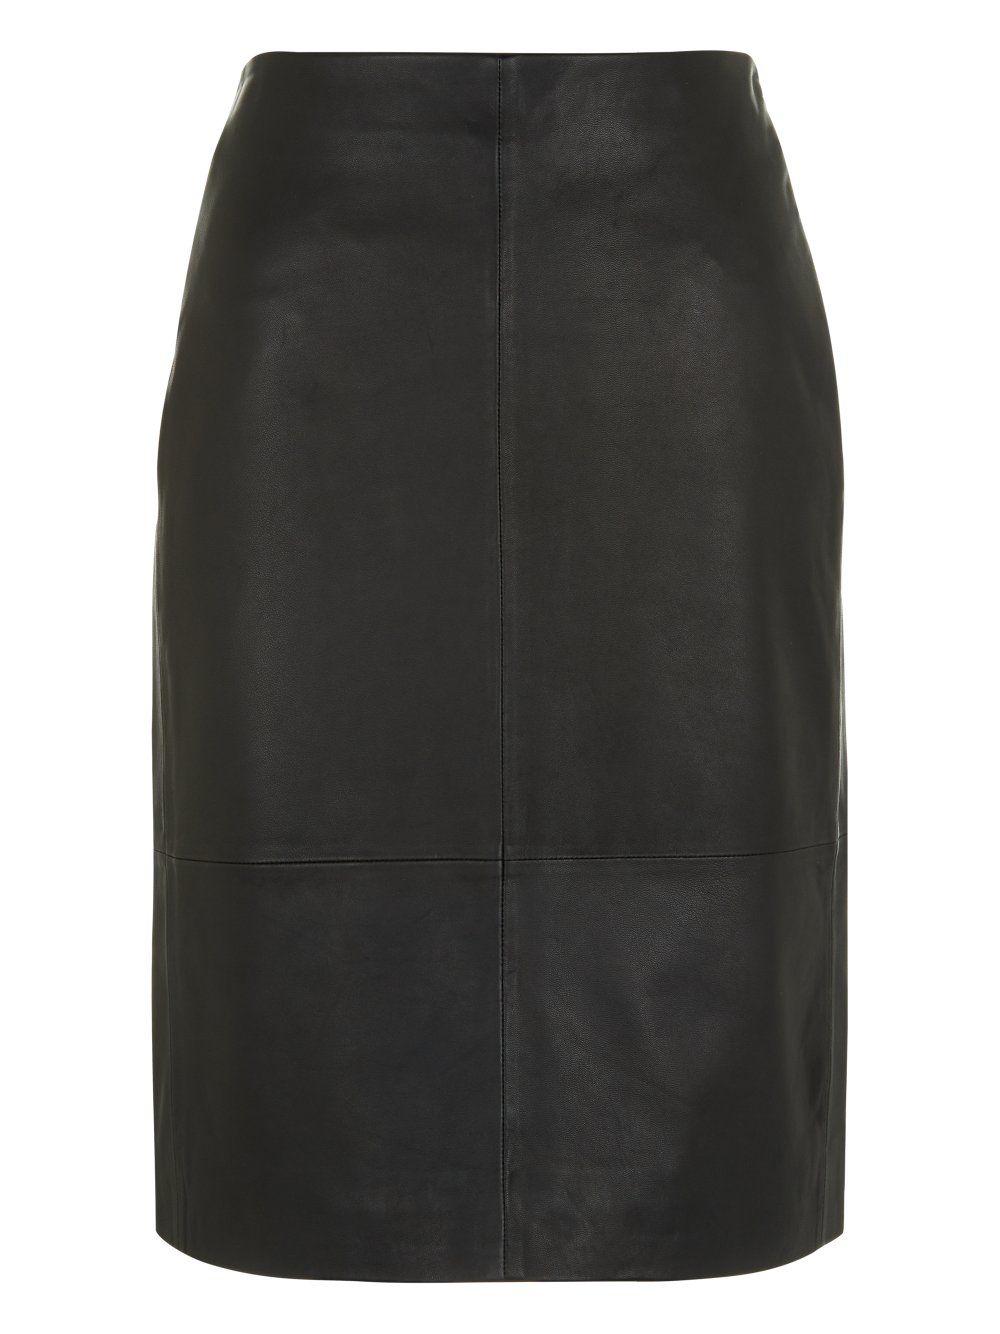 7726aa9df Yates Black Leather Pencil Skirt #Muubaa #AW15   Fashion   Black ...